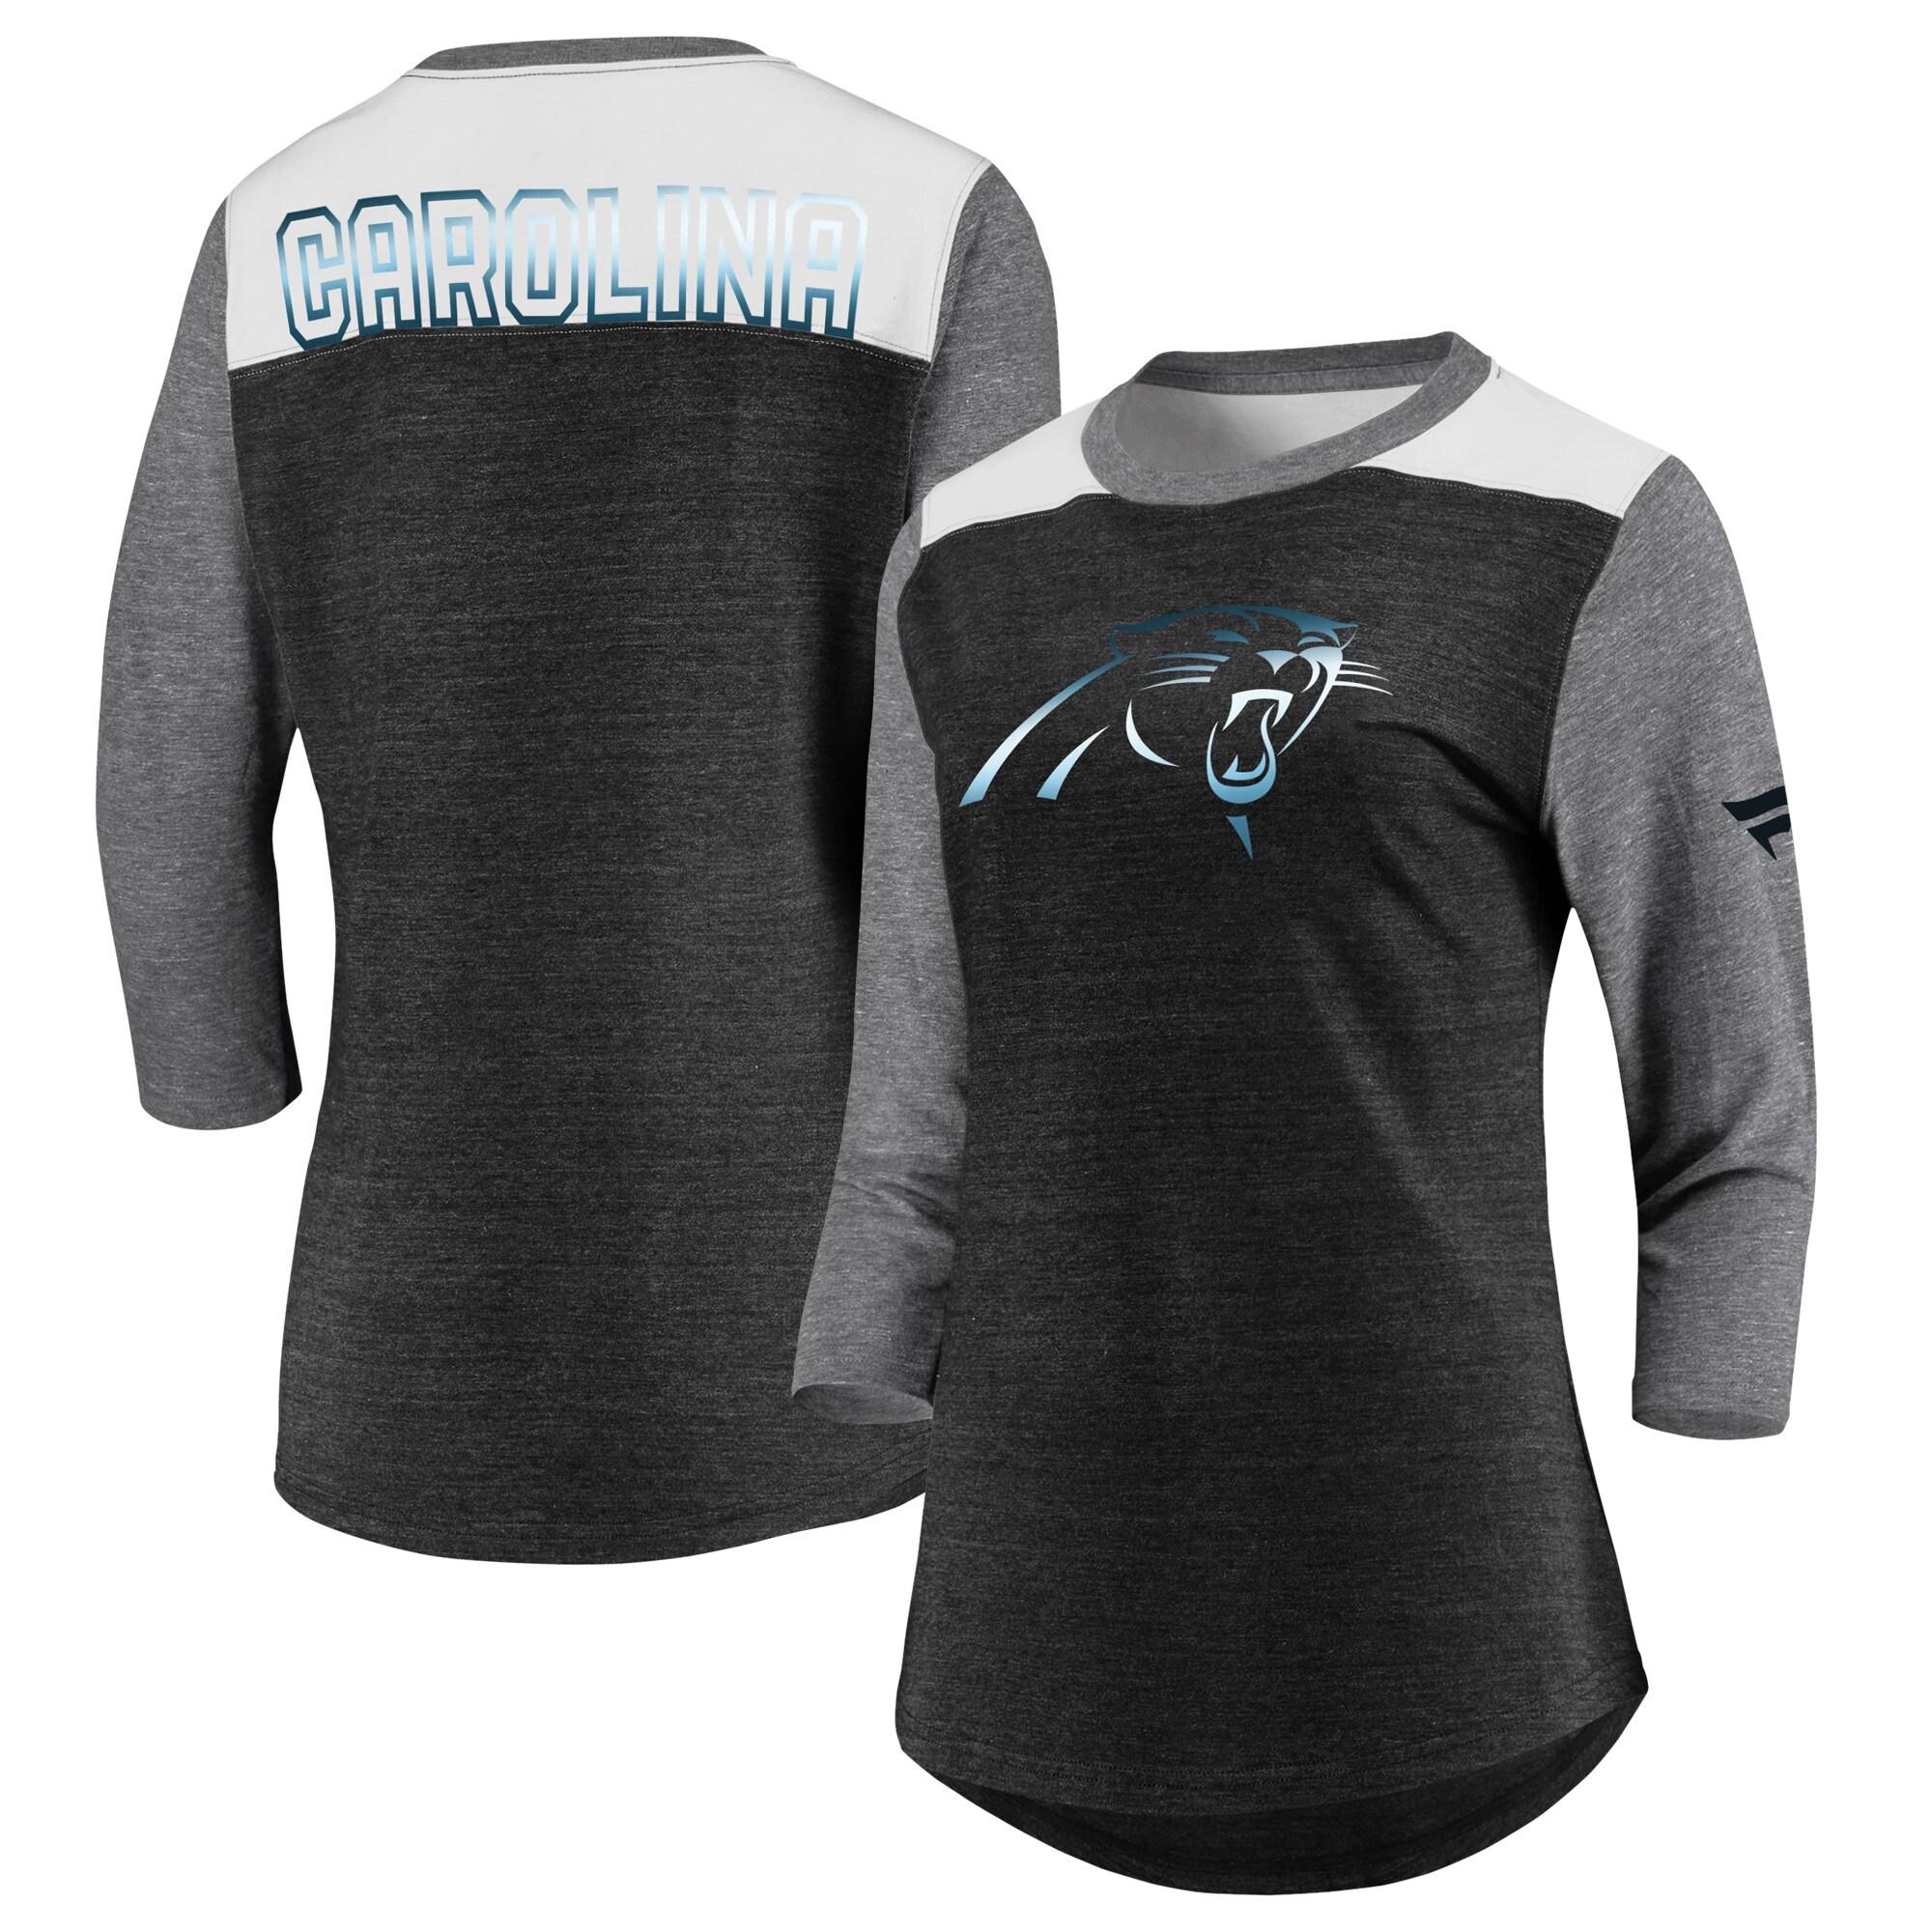 Carolina Panthers NFL Pro Line by Fanatics Branded Women's Iconic 3/4 Sleeve T-Shirt - Black/Heathered Gray